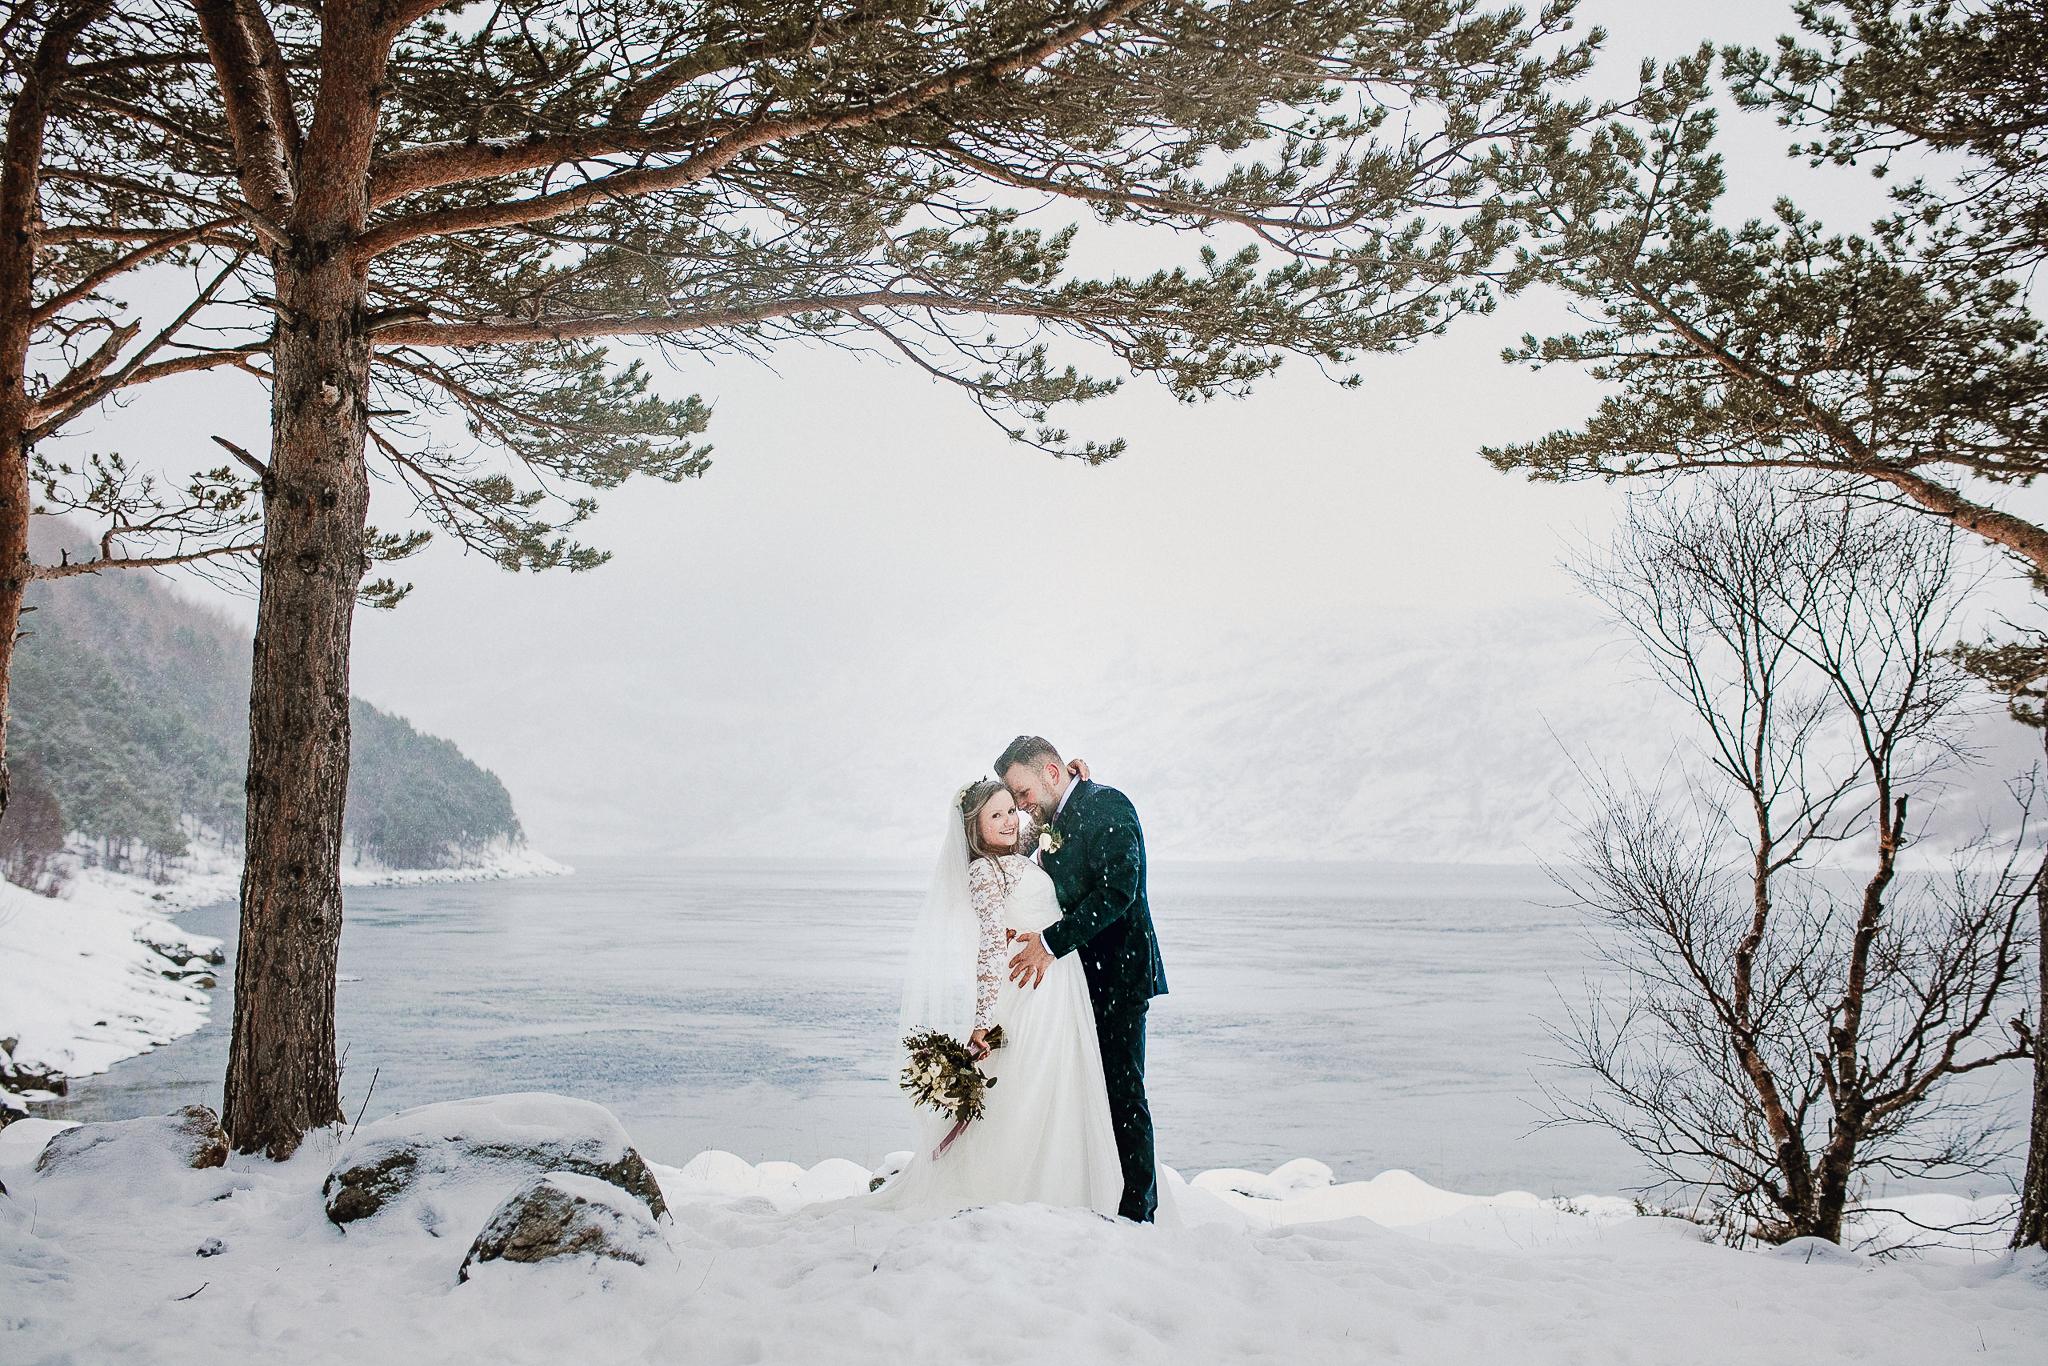 Brudepar omfavner hverandre under flere furutrær foran sjøen i snøvær.